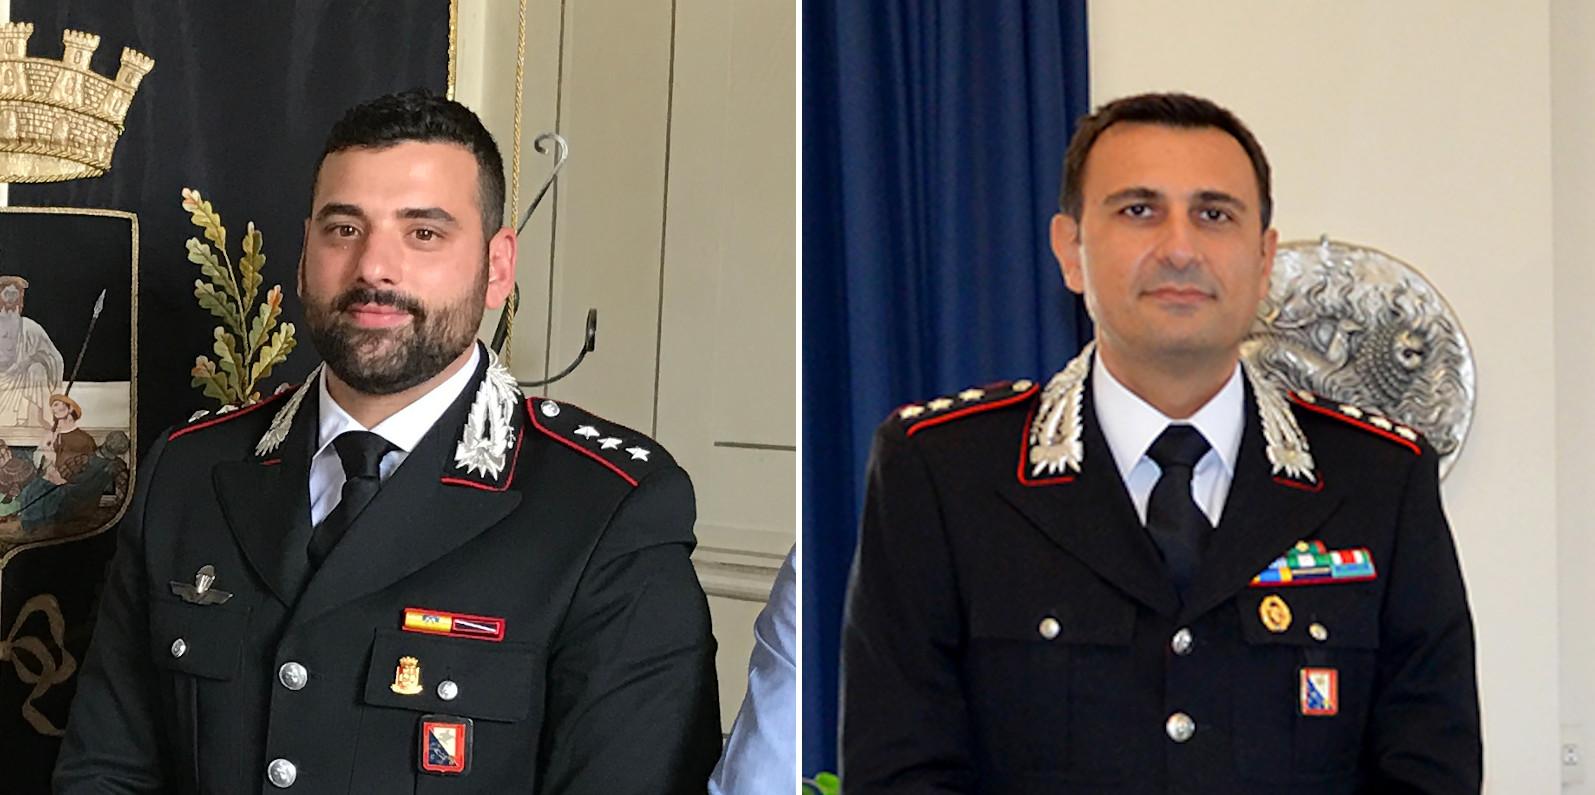 sansepolcro compagnia carabinieri capitano feola